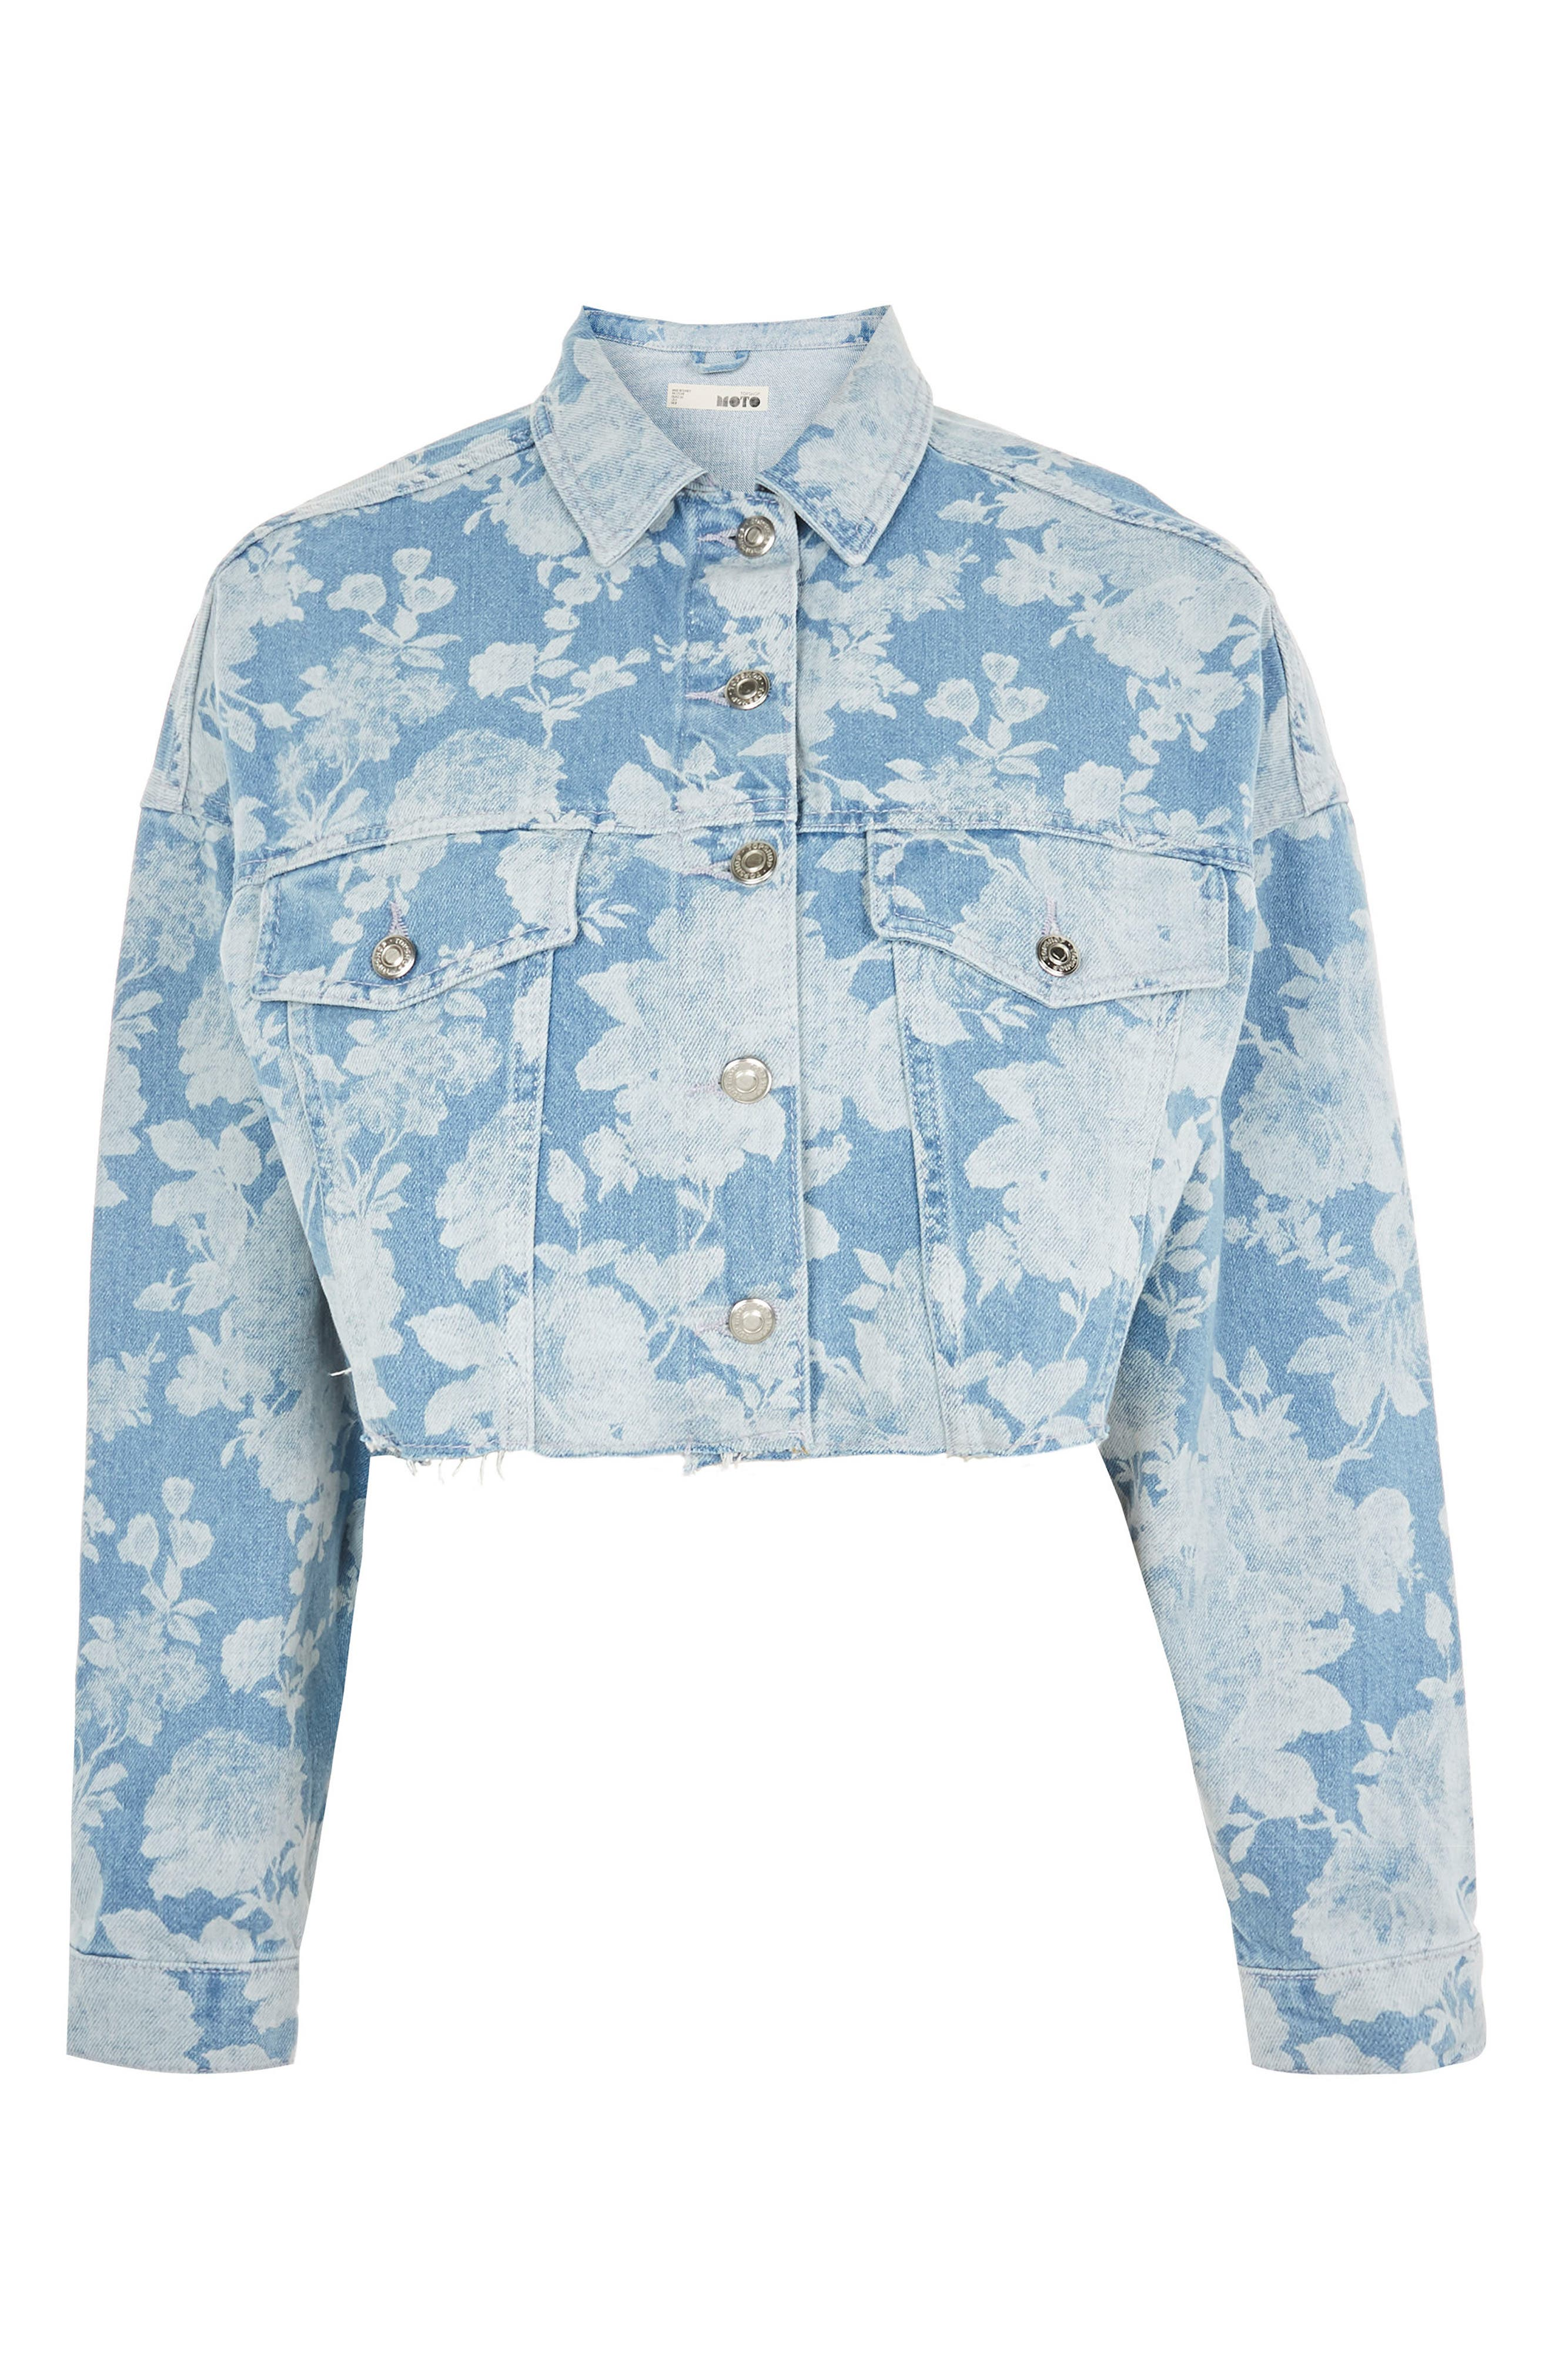 Floral Moto Two-Tone Denim Jacket,                             Alternate thumbnail 5, color,                             Mid Denim Multi